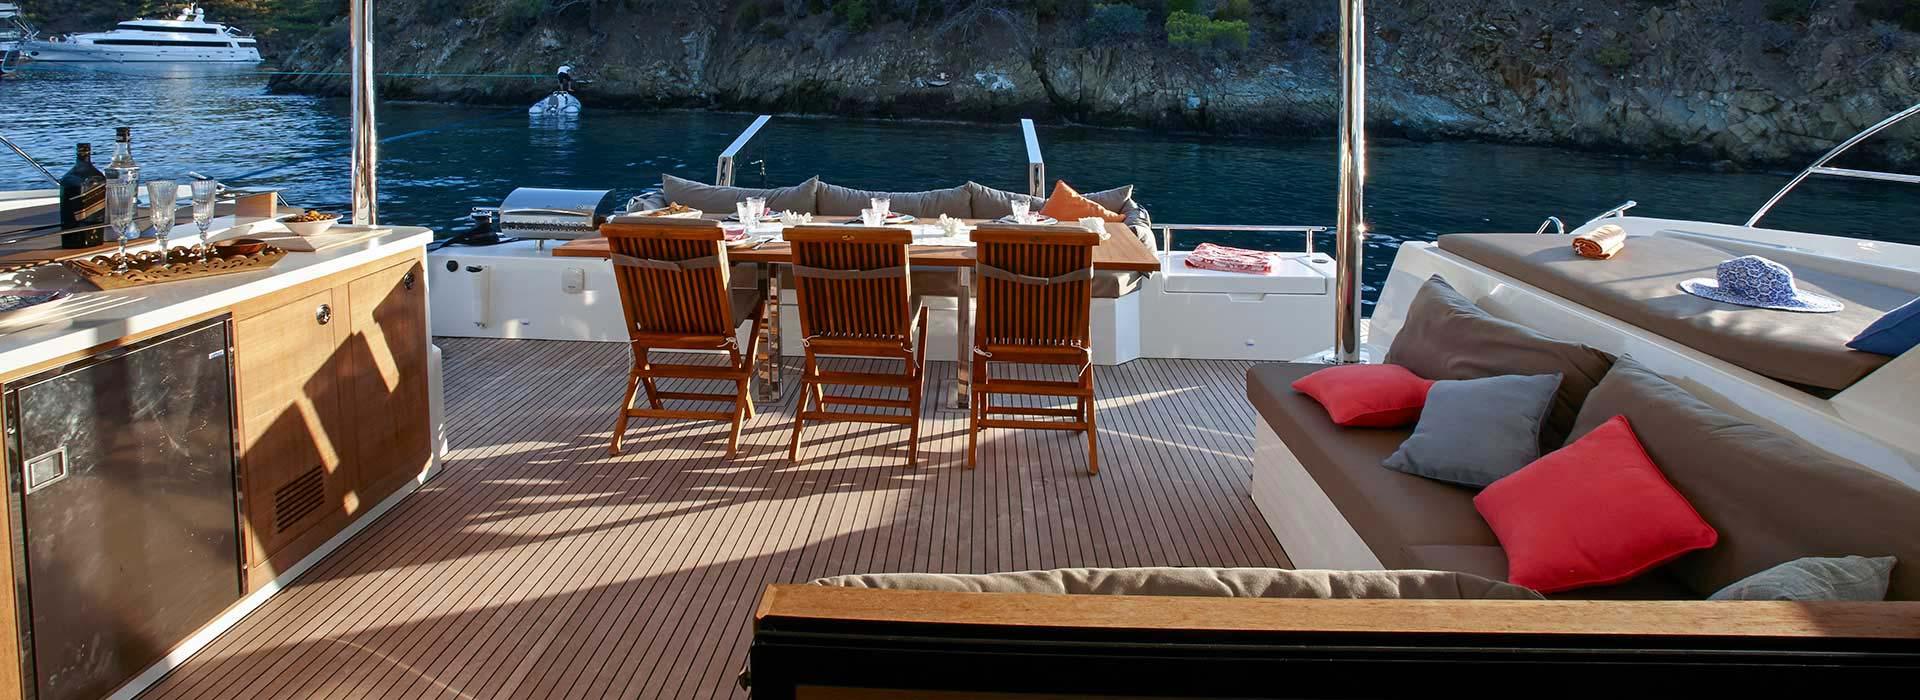 People enjoying their luxury yacht ownership